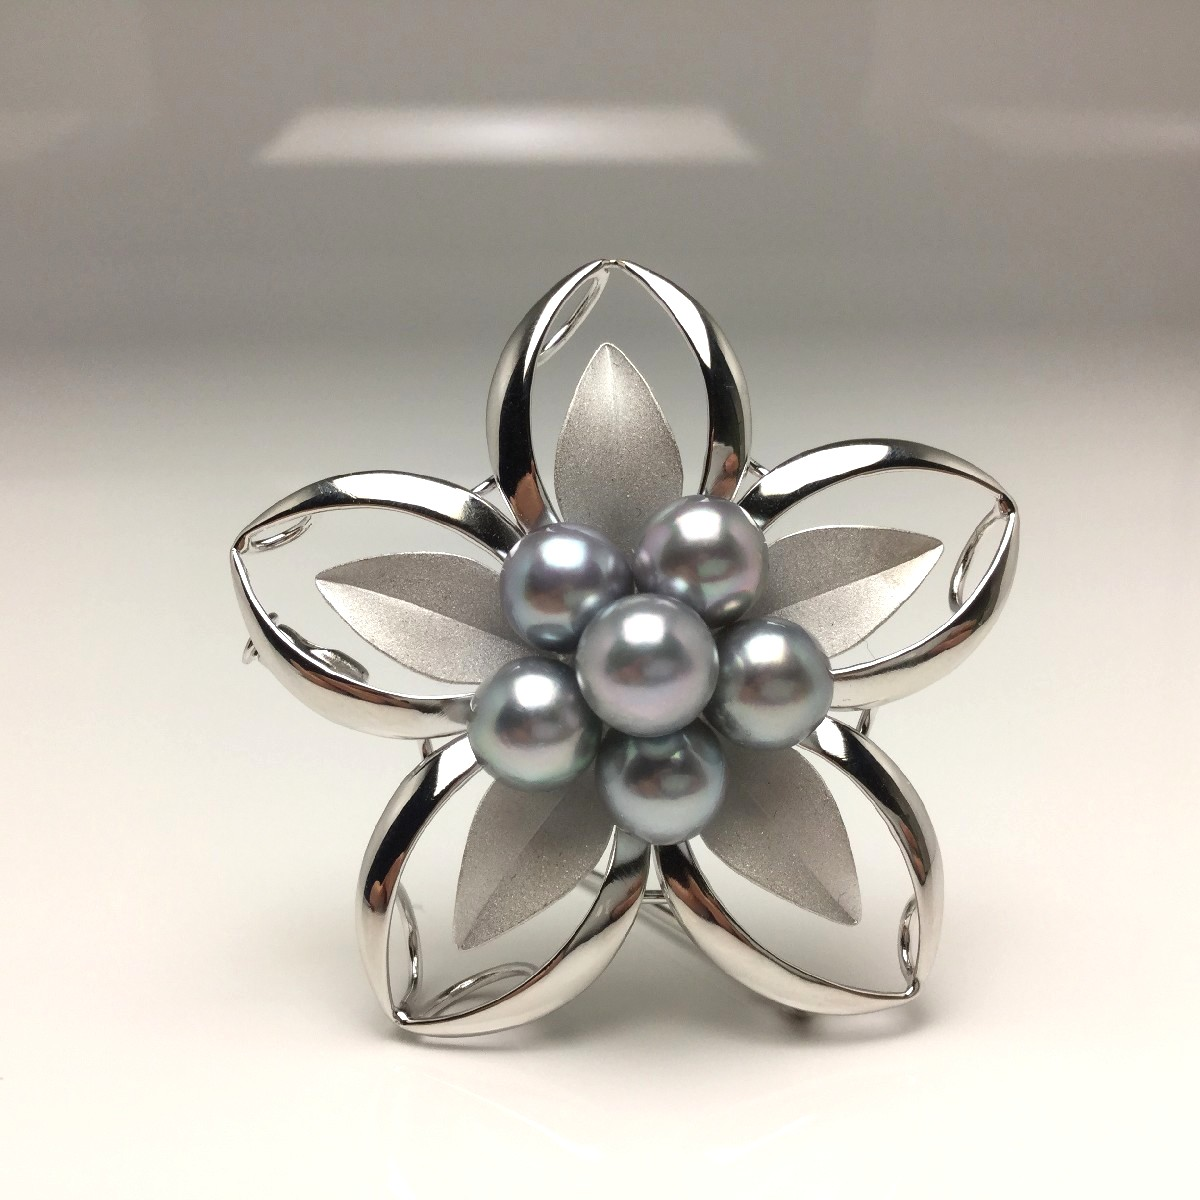 【10%OFF】真珠 ブローチ パール アコヤ真珠 7.0-7.5mm シルバーブルーグレー シルバー 植物 フラワー 66218 イソワパール